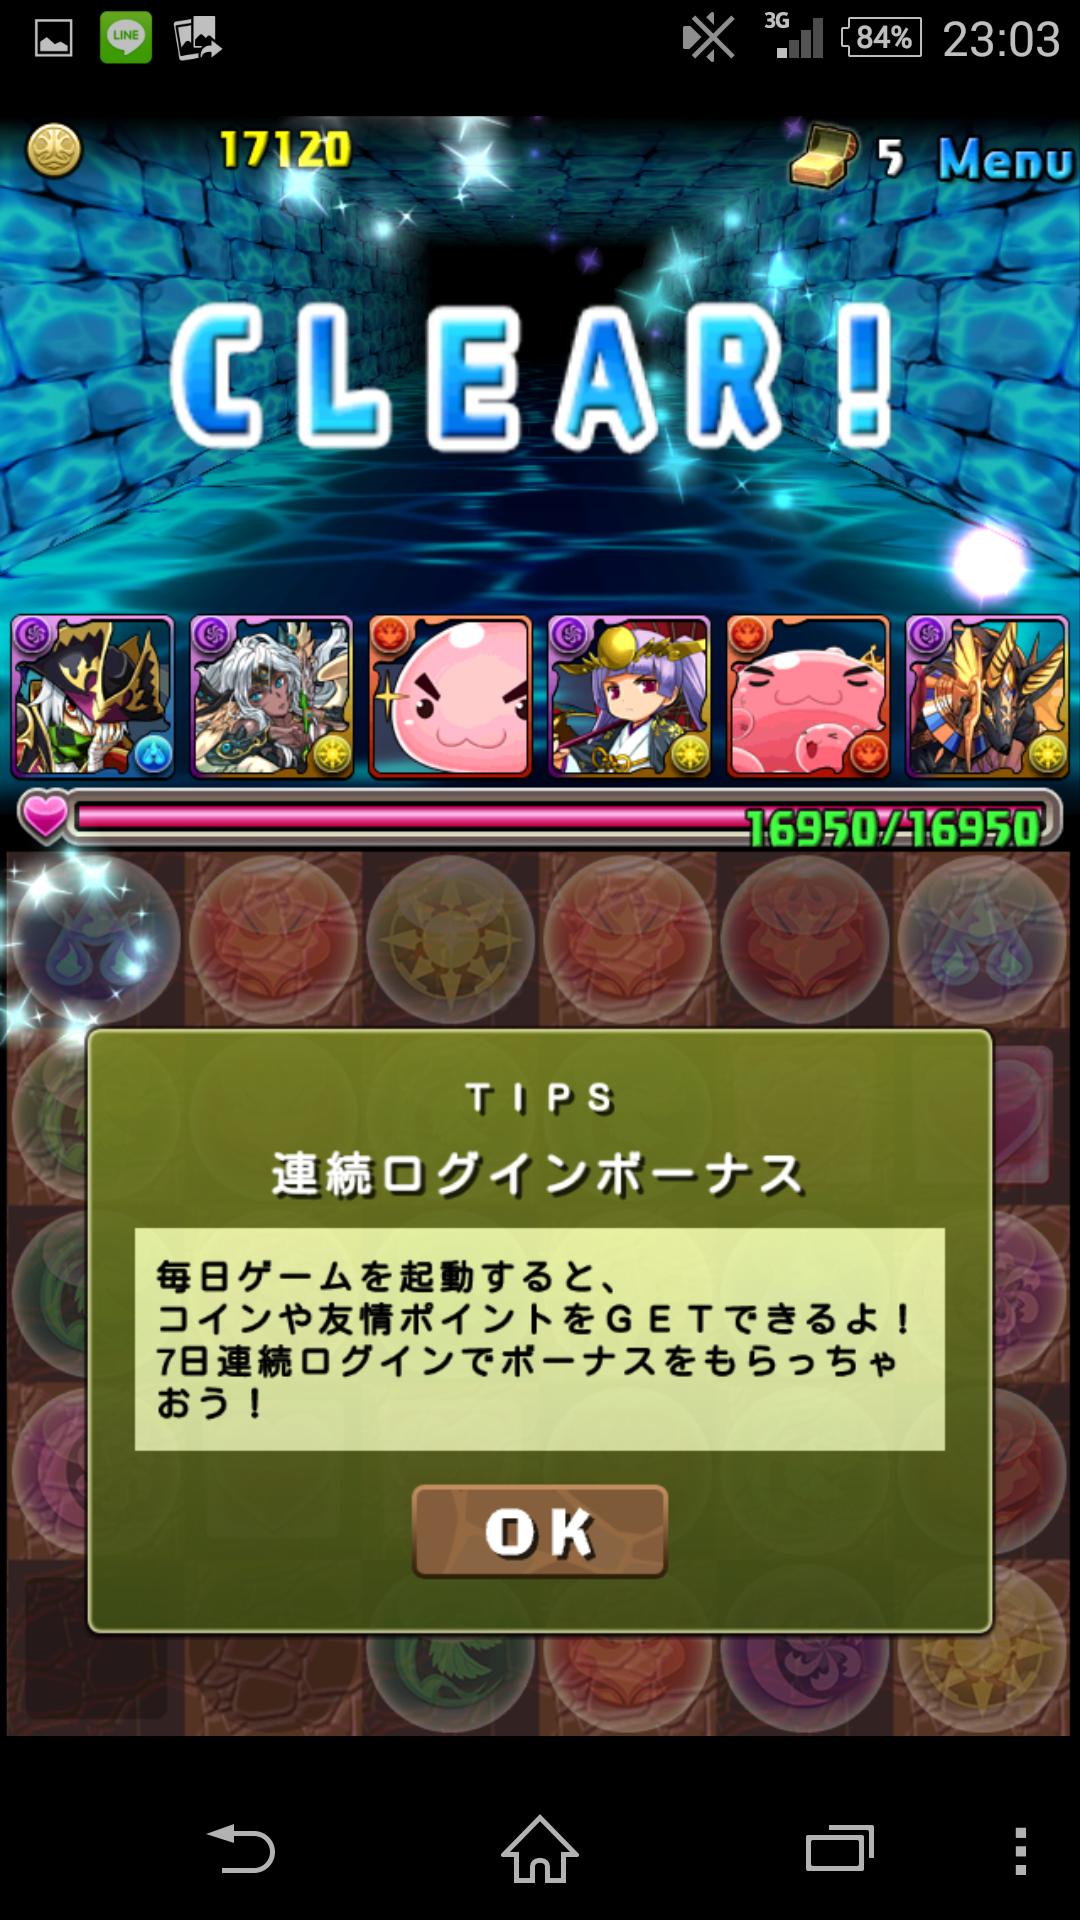 Screenshot_2014-08-27-23-03-40.png